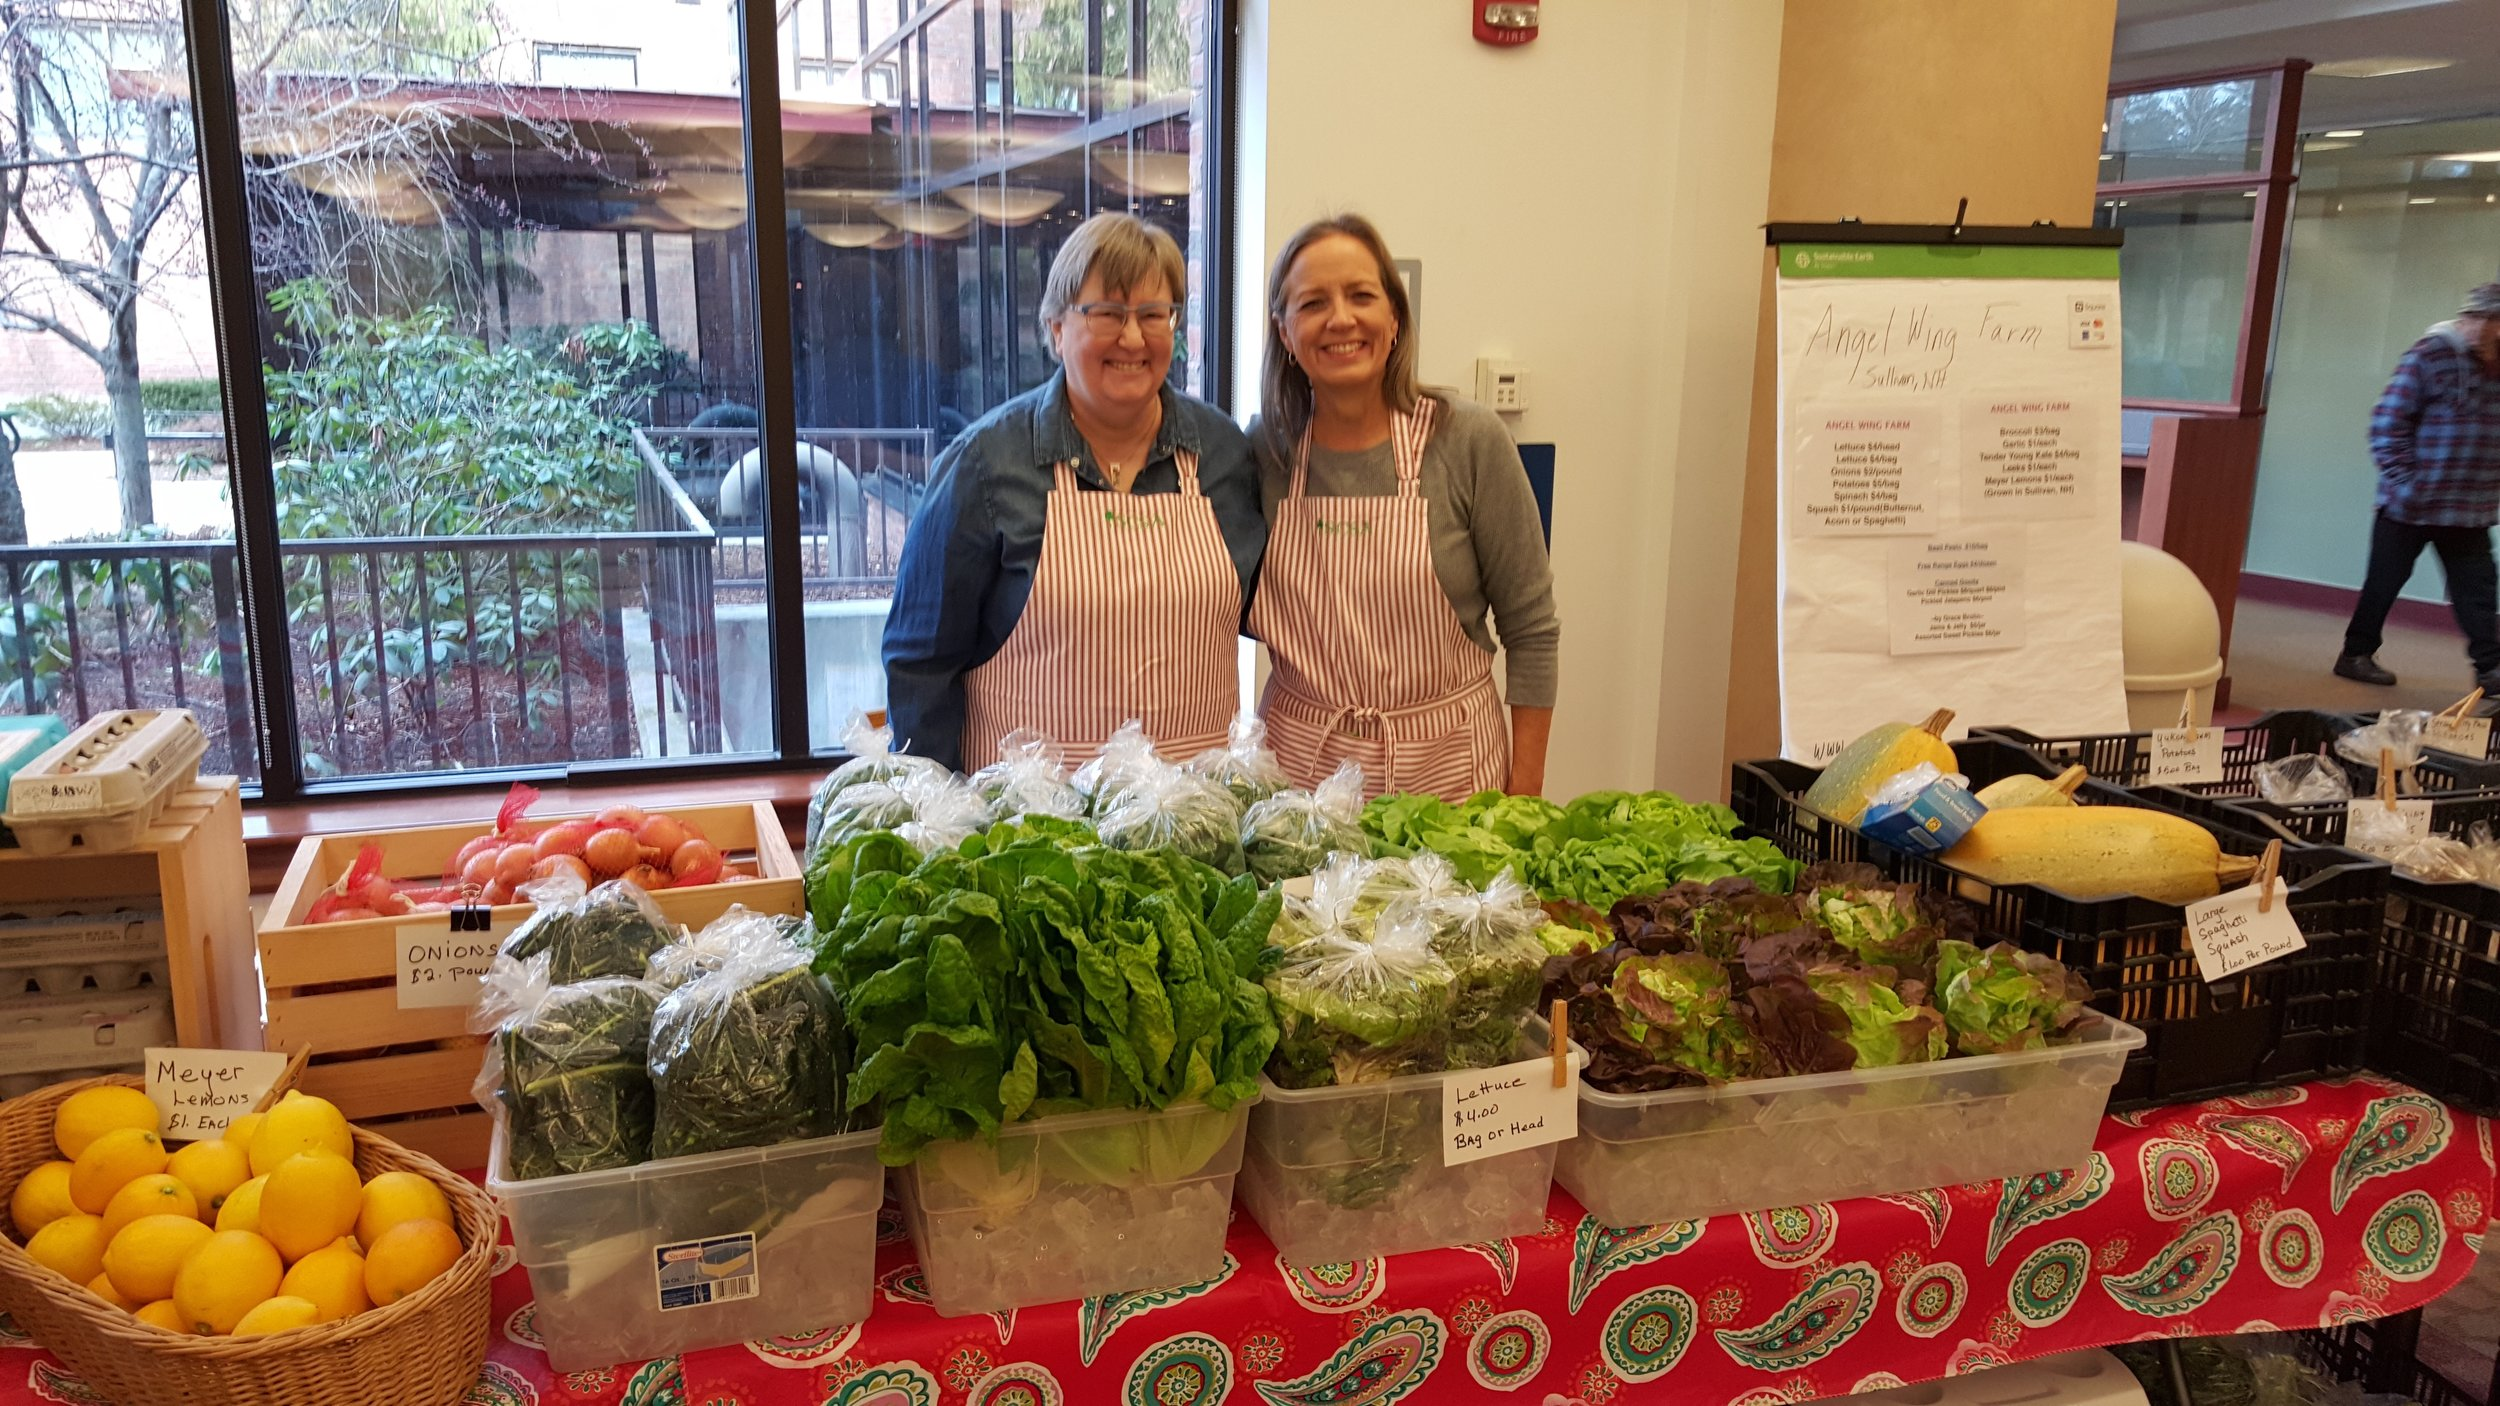 Marsha and Carol at the Wednesday farmer's market at CMC/DHK.